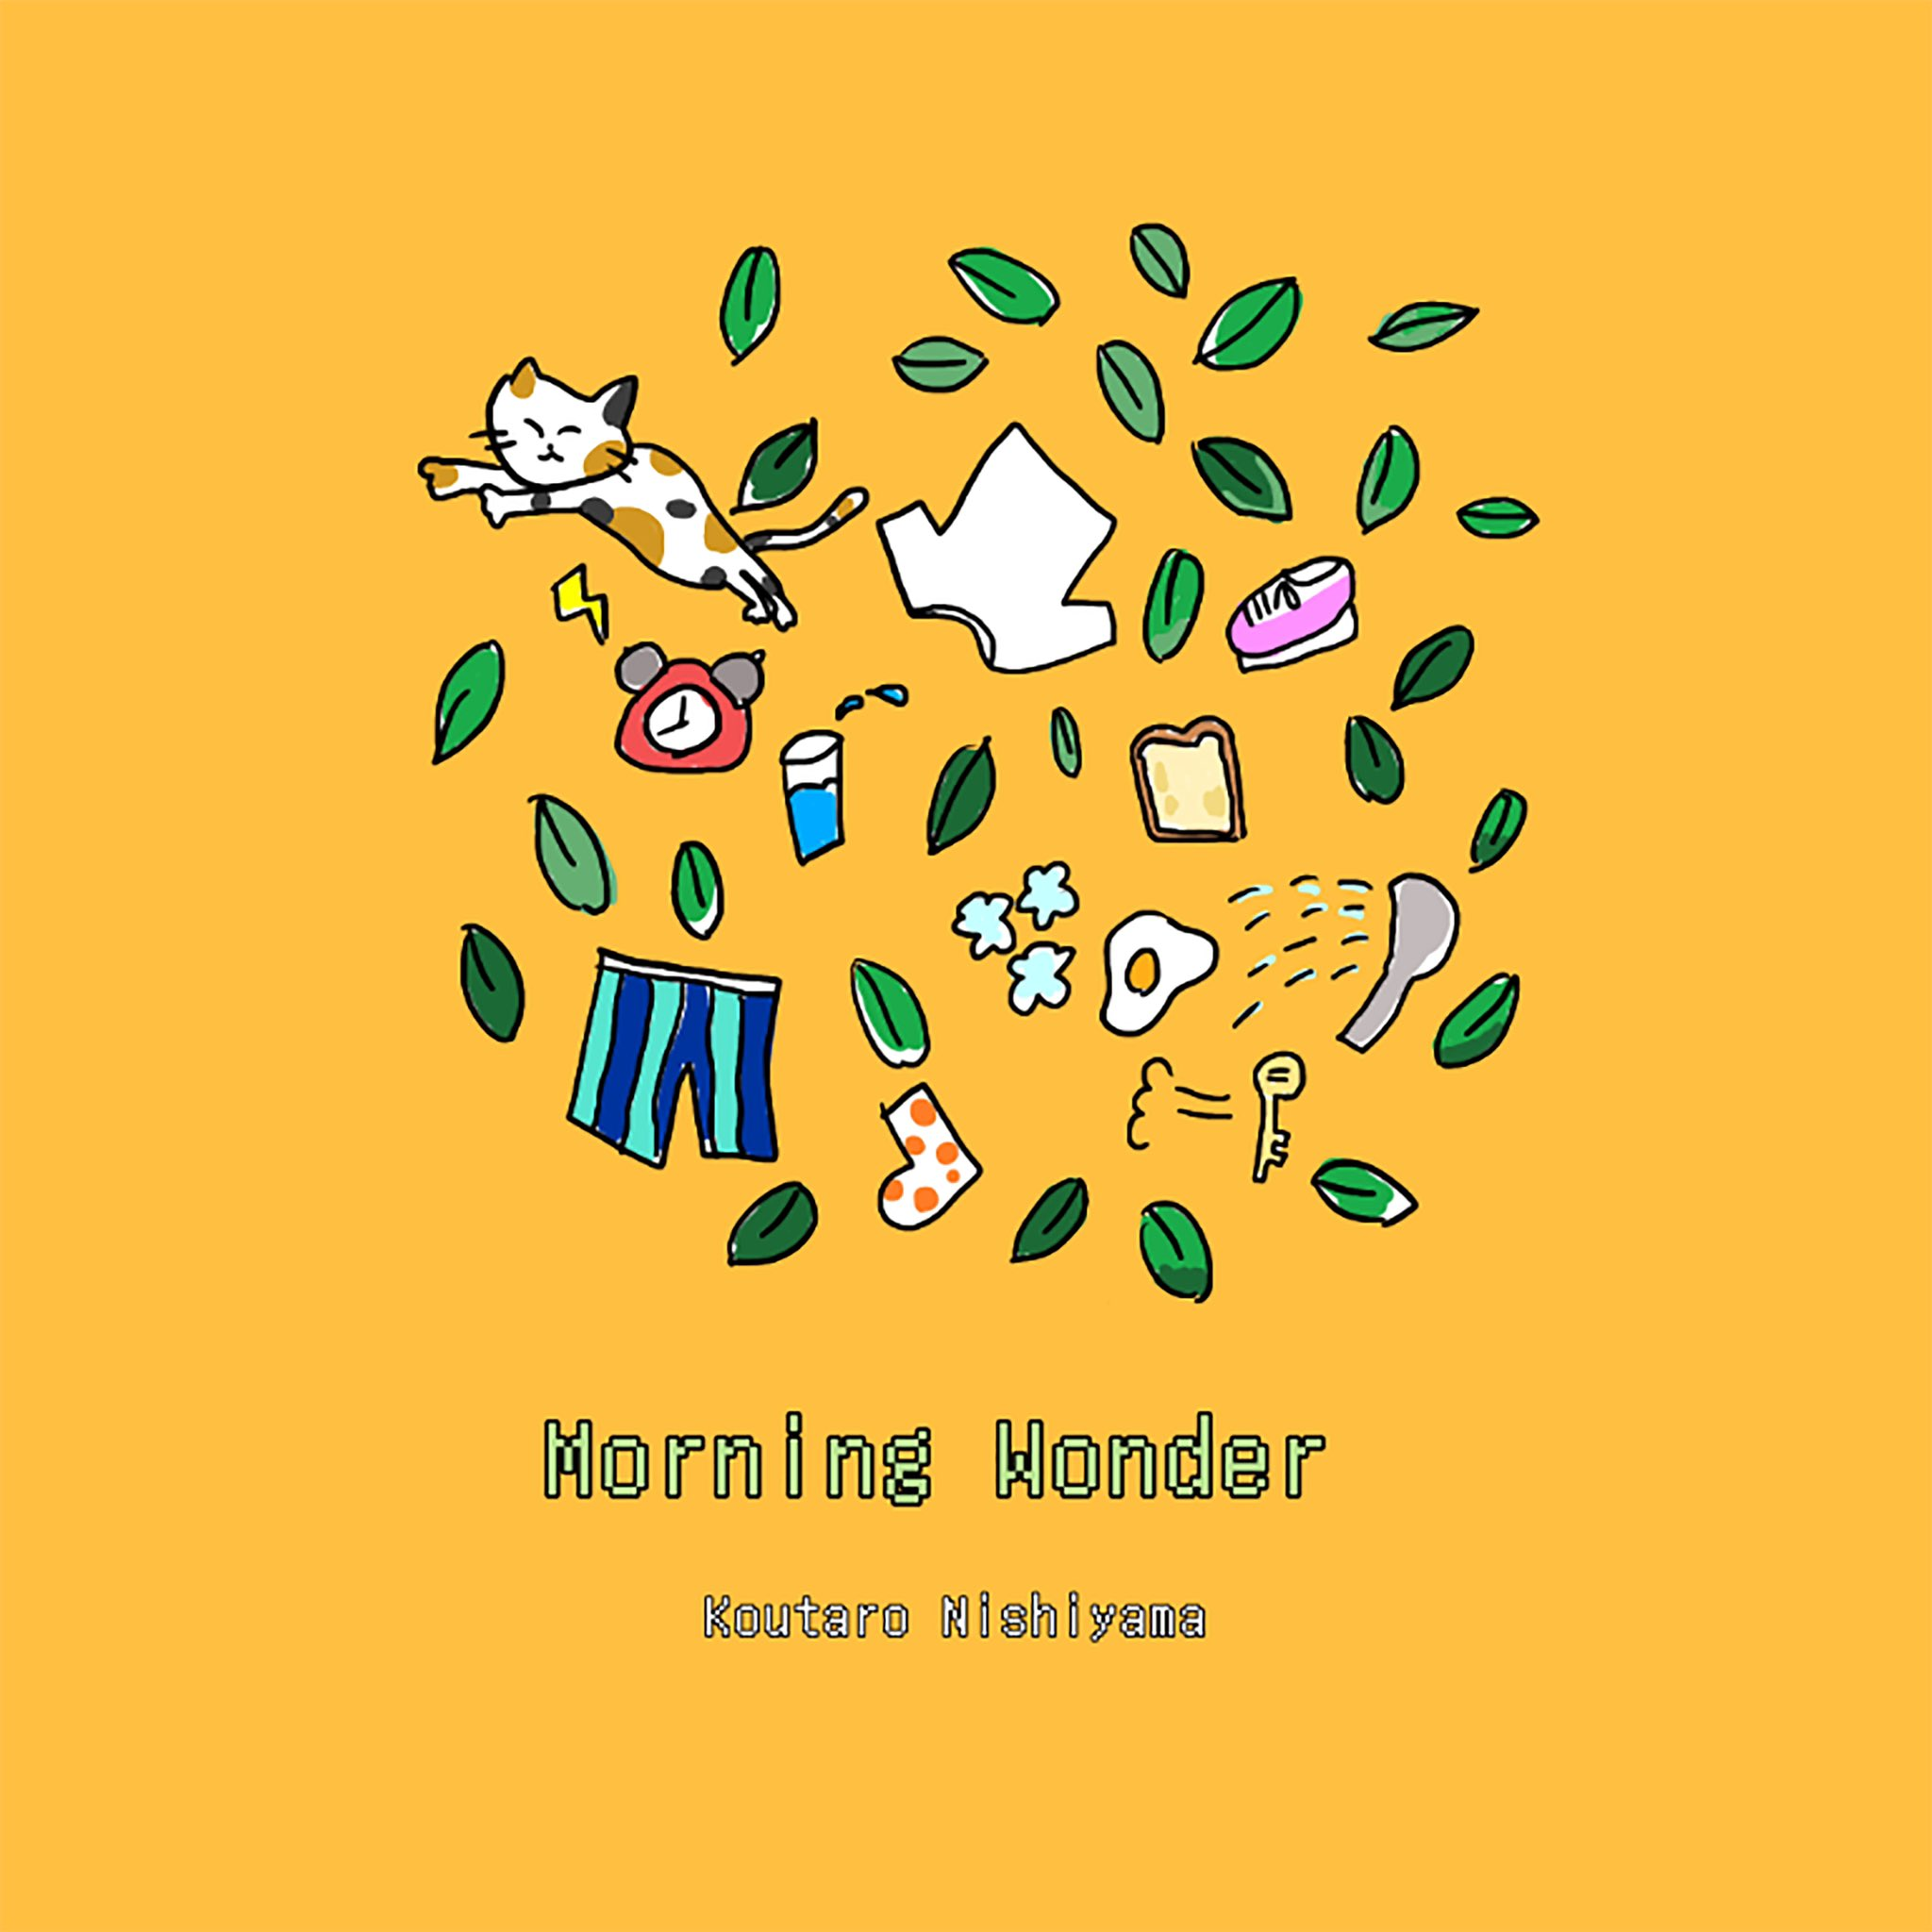 西山宏太朗 - Morning Wonder